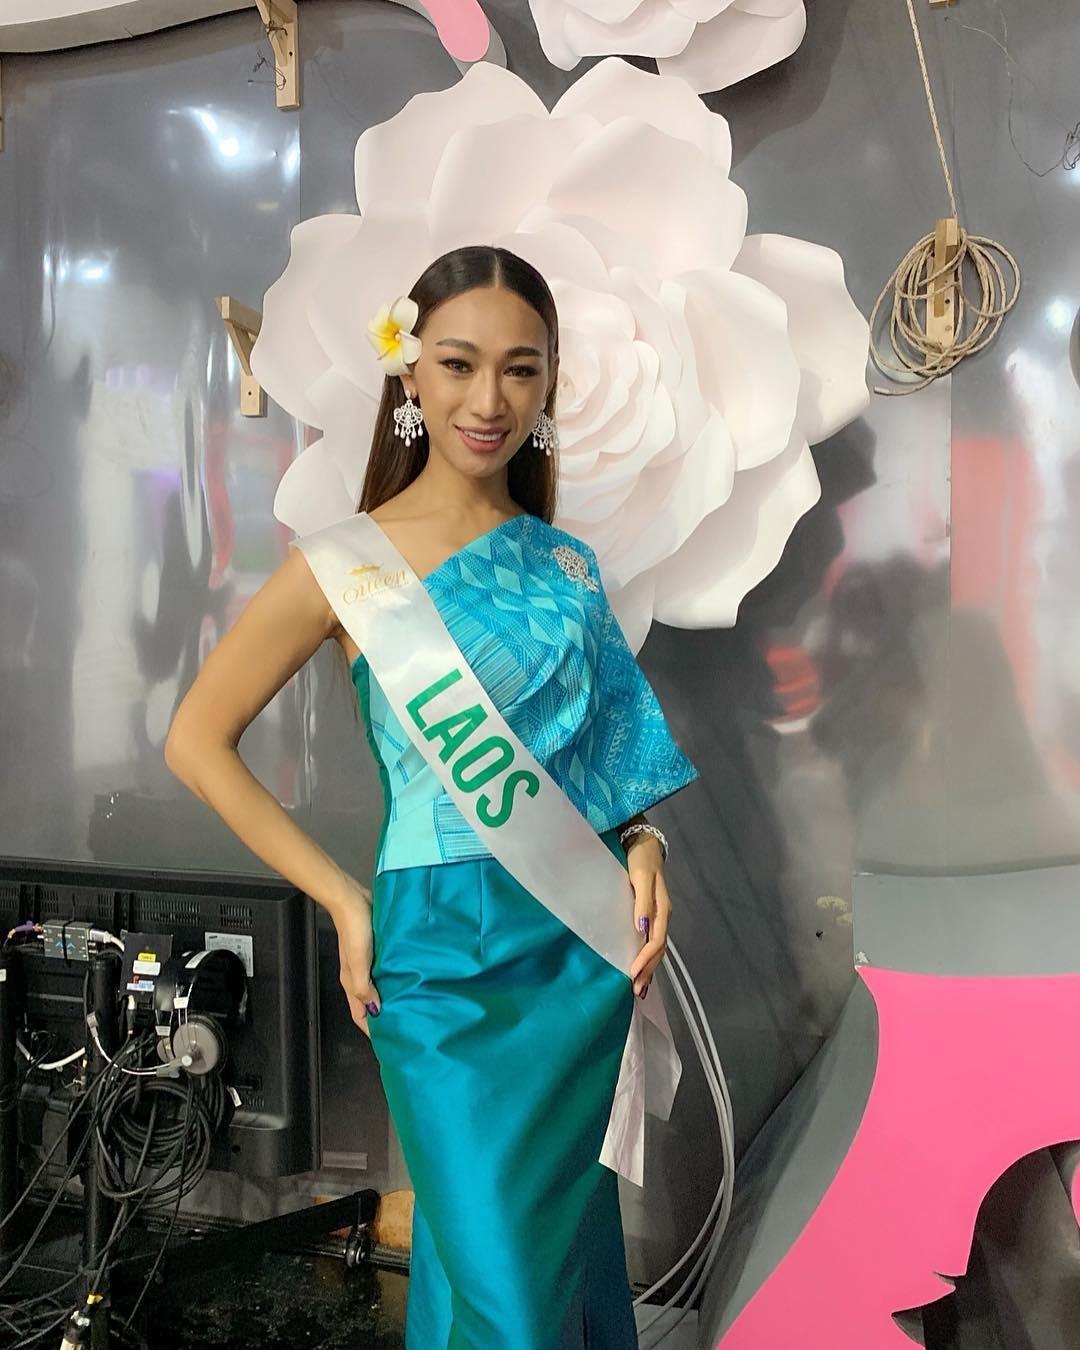 Kanrayany Phothimath – Miss International Queen Laos 2019